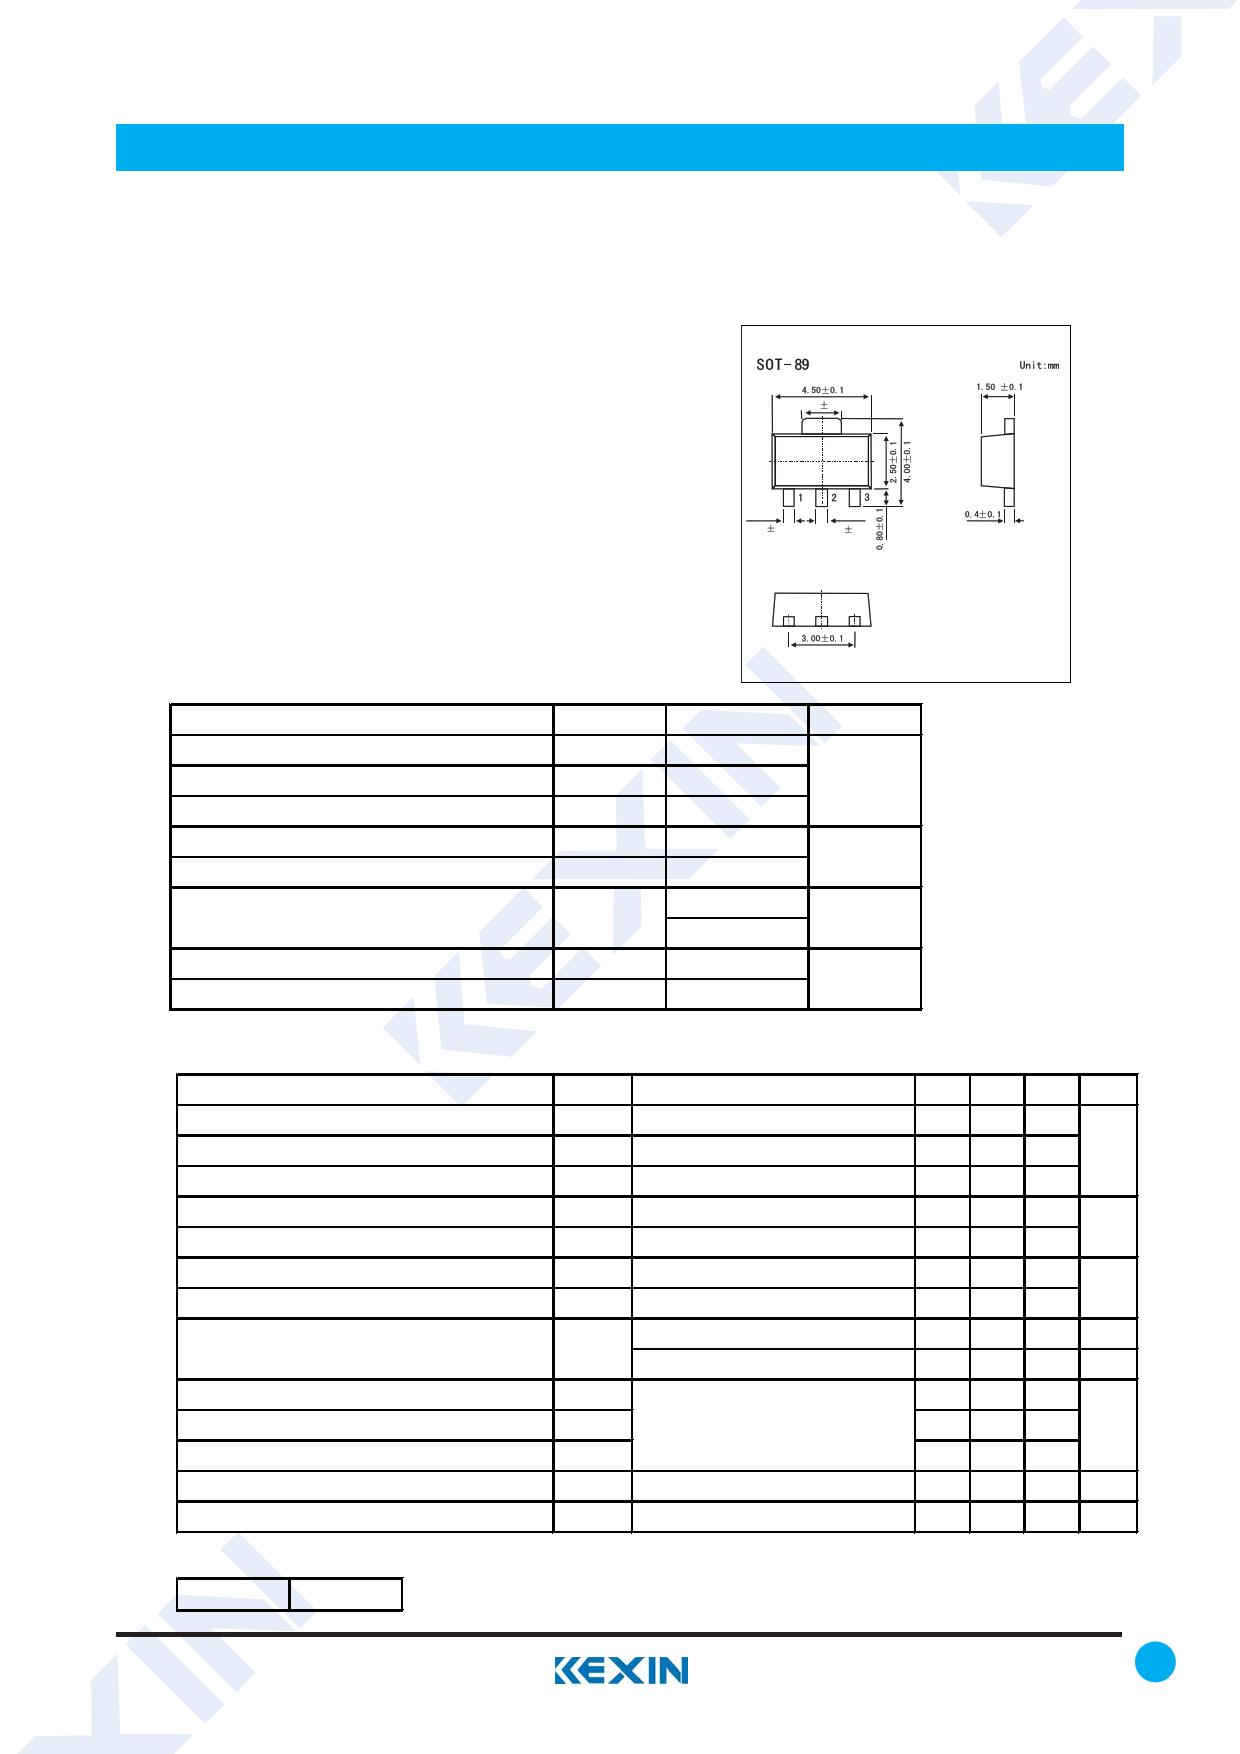 2SC4539 데이터시트 및 2SC4539 PDF